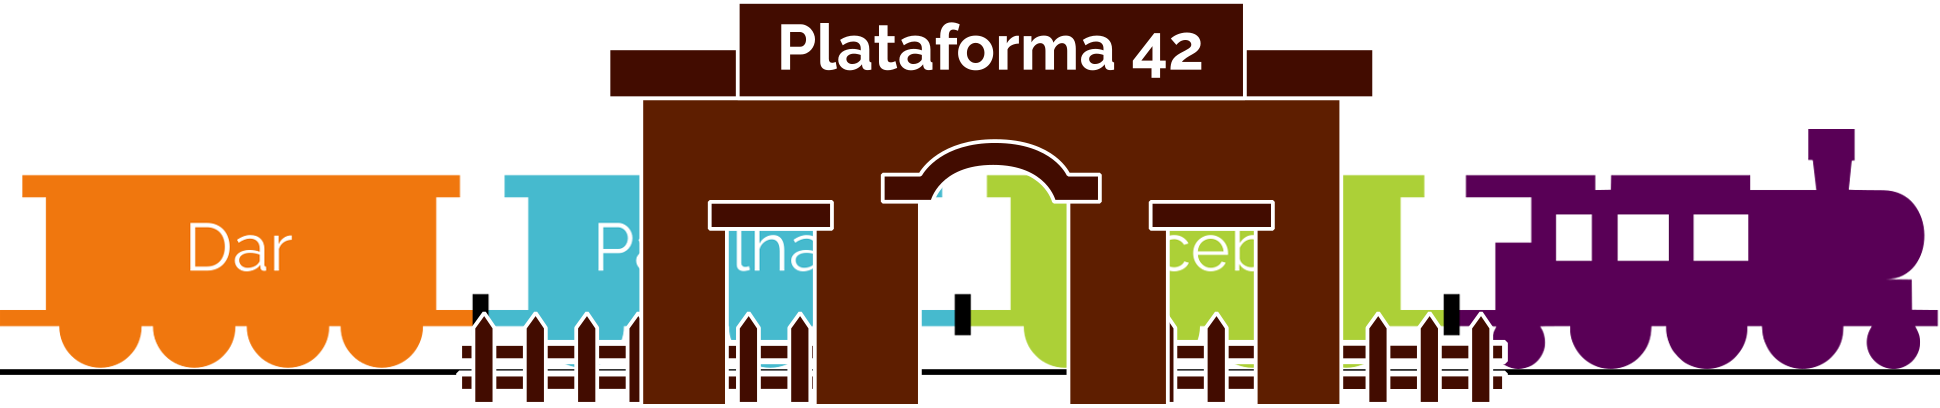 Plataforma_Comboio